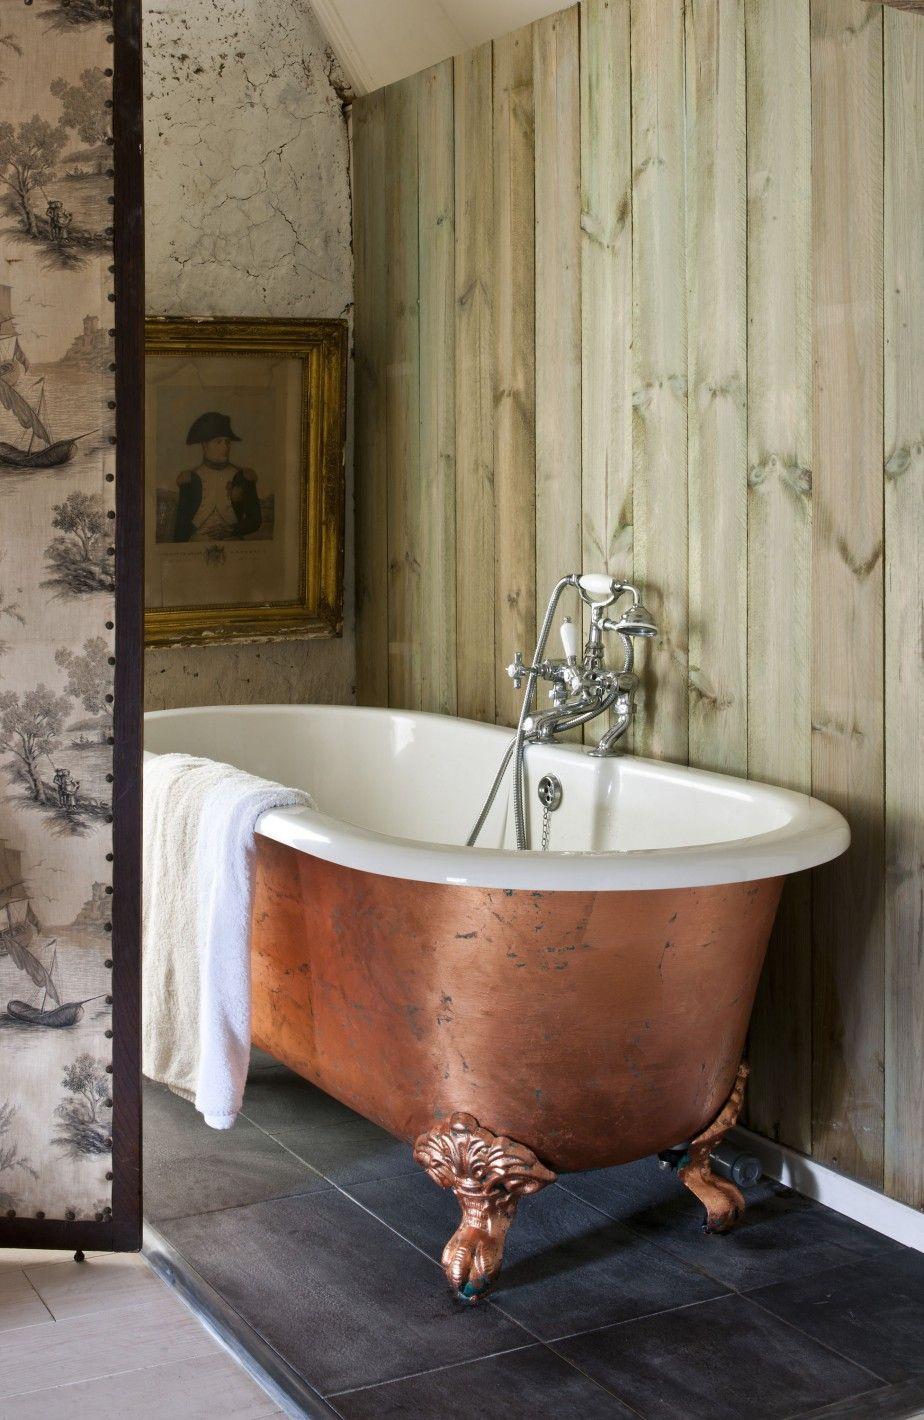 Bathroom, : Astonishing Picture Of Bathroom Decoration Using Gold ...